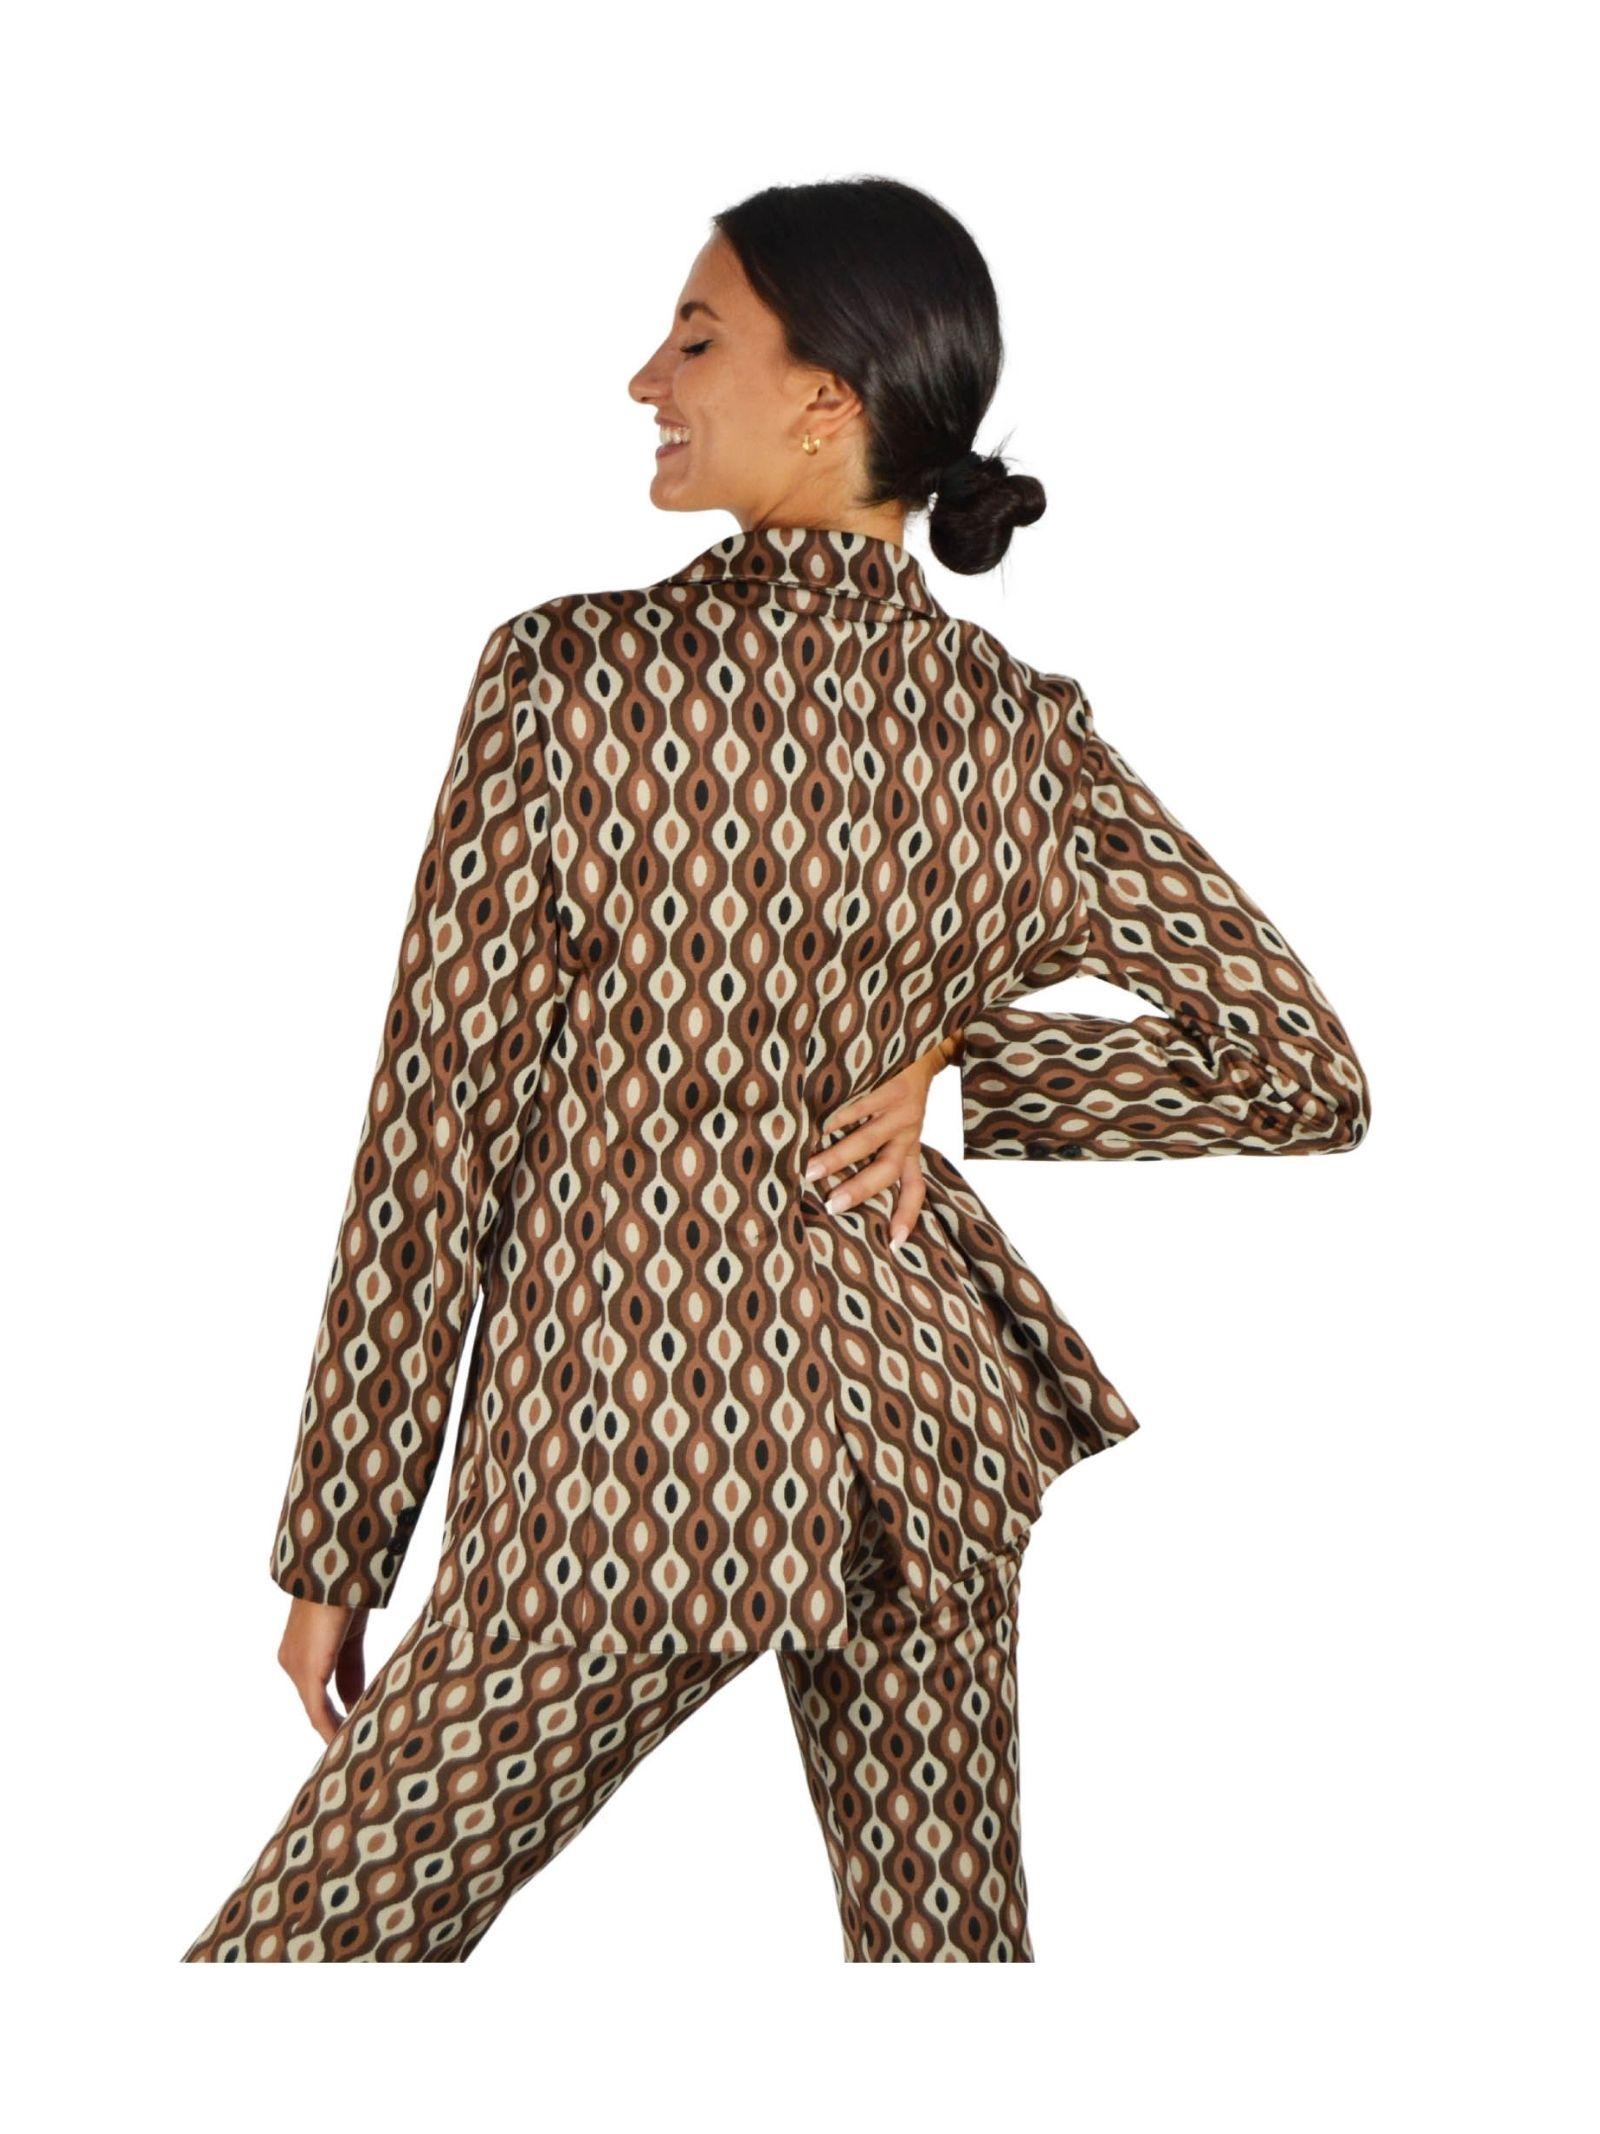 Giacca Donna Naturale Maliparmi | Cappotti e Giacche | JD638060033B1218